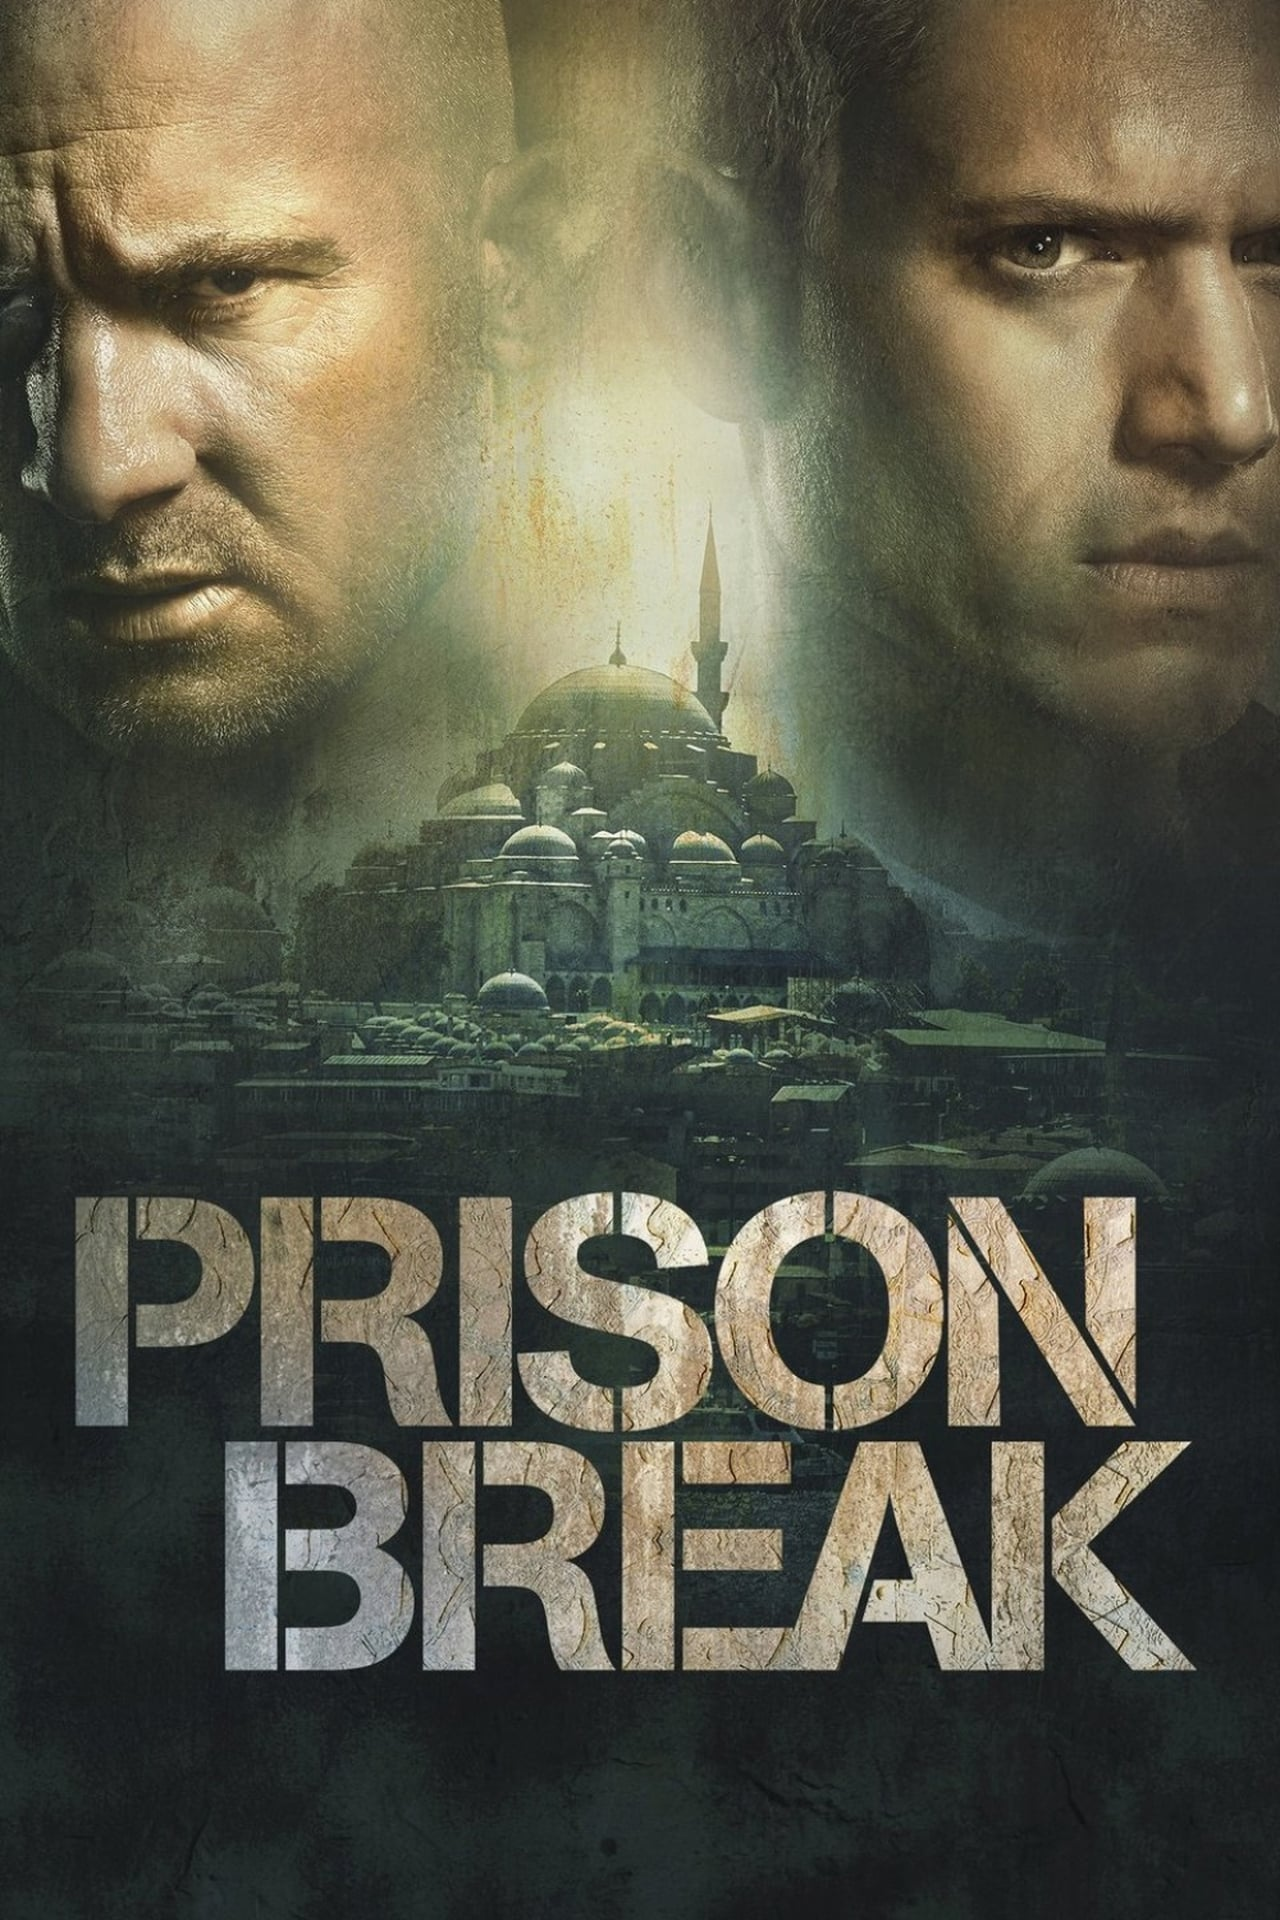 Prison Break Season 1 Episode 7 Subtitles - my-subs.co